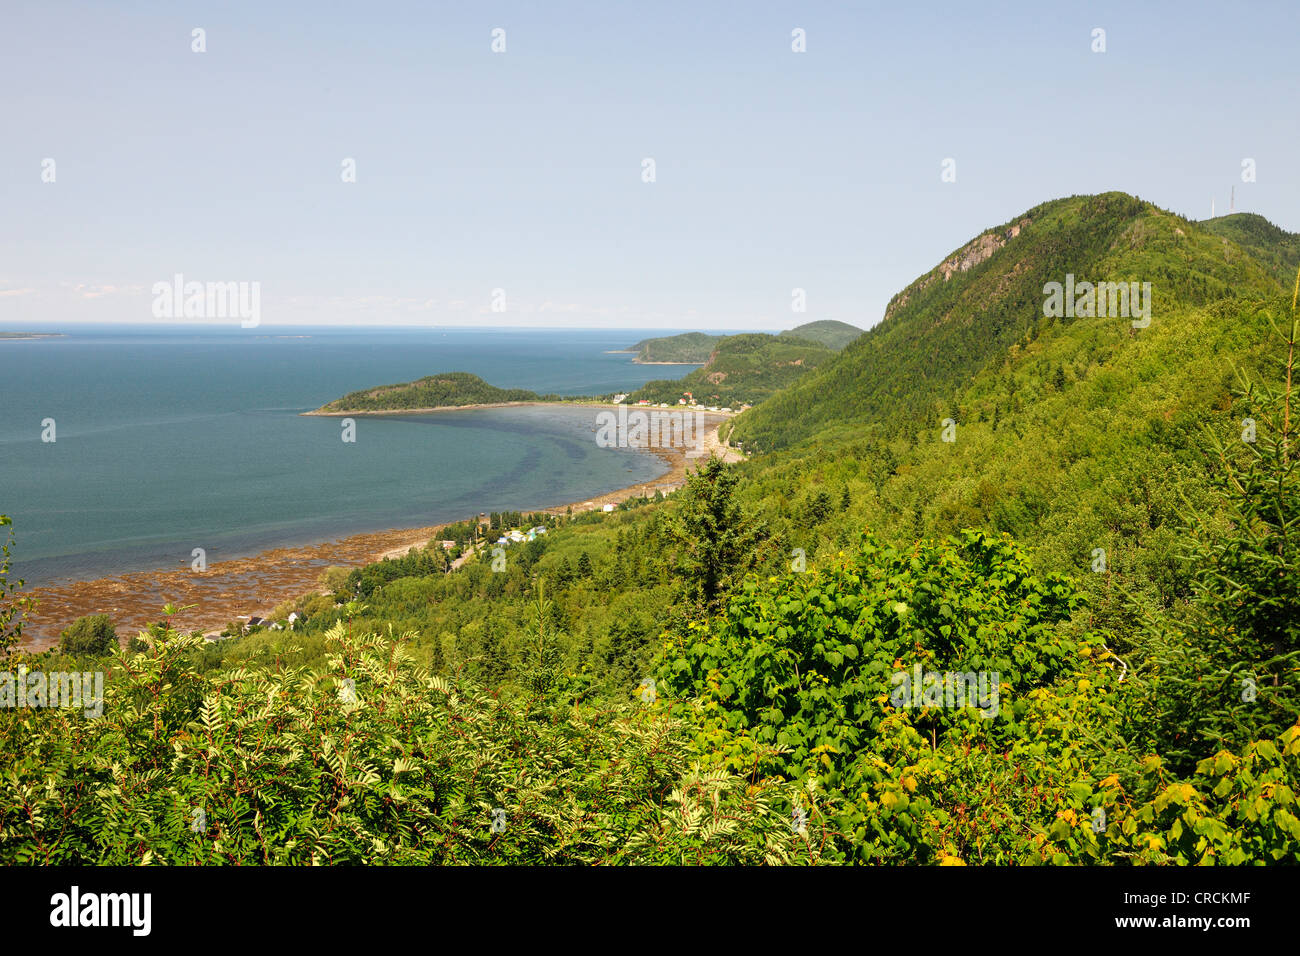 Coastline along the St. Lawrence River, Gaspe Peninsula, Gaspésie, Quebec, Canada - Stock Image